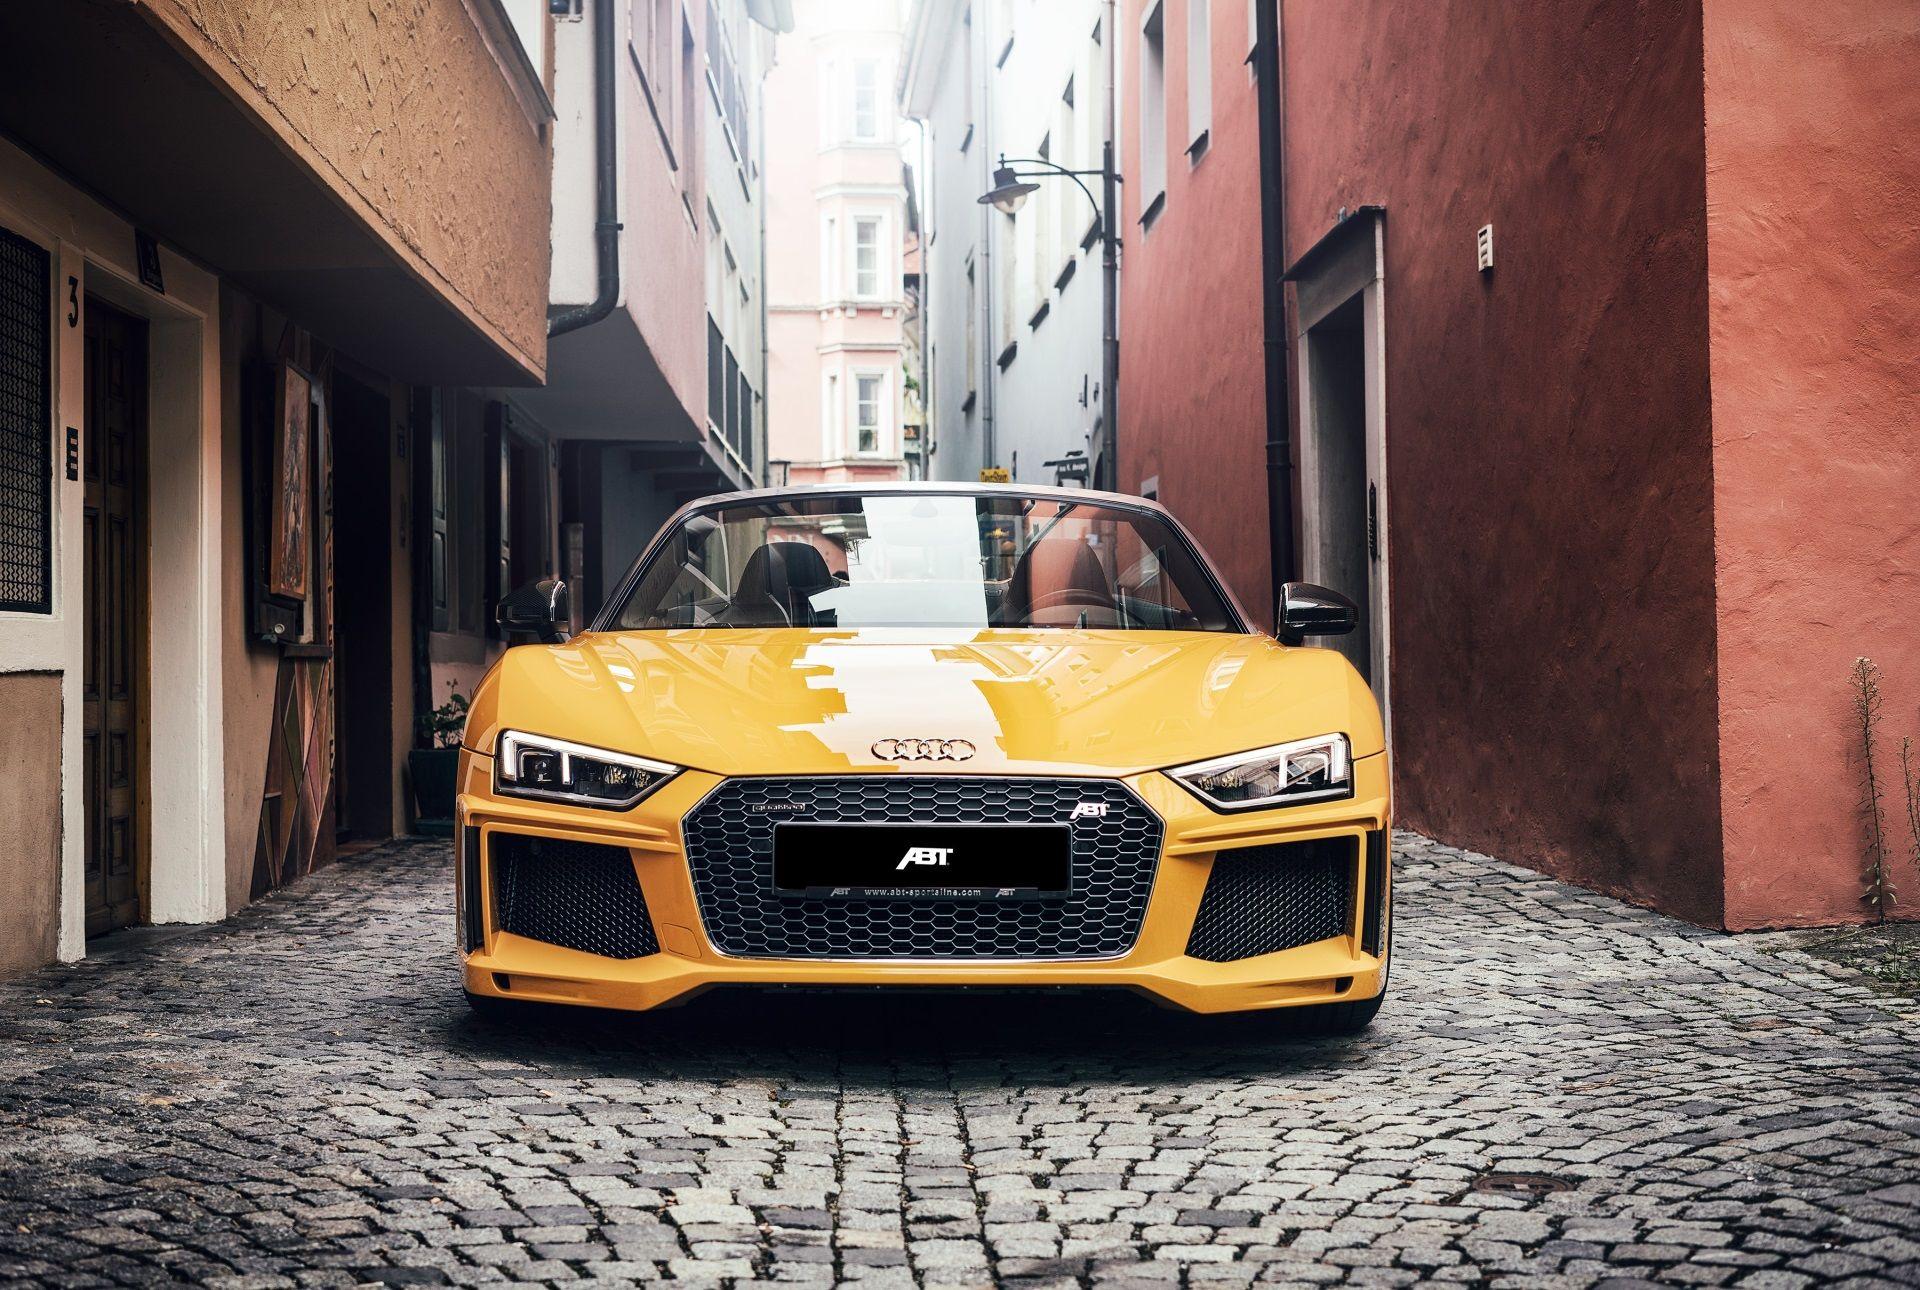 1920x1290 Abt Audi R8 Spyder Wallpaper Download Free For Pc Hd Audi R8 Spyder Audi R8 Audi